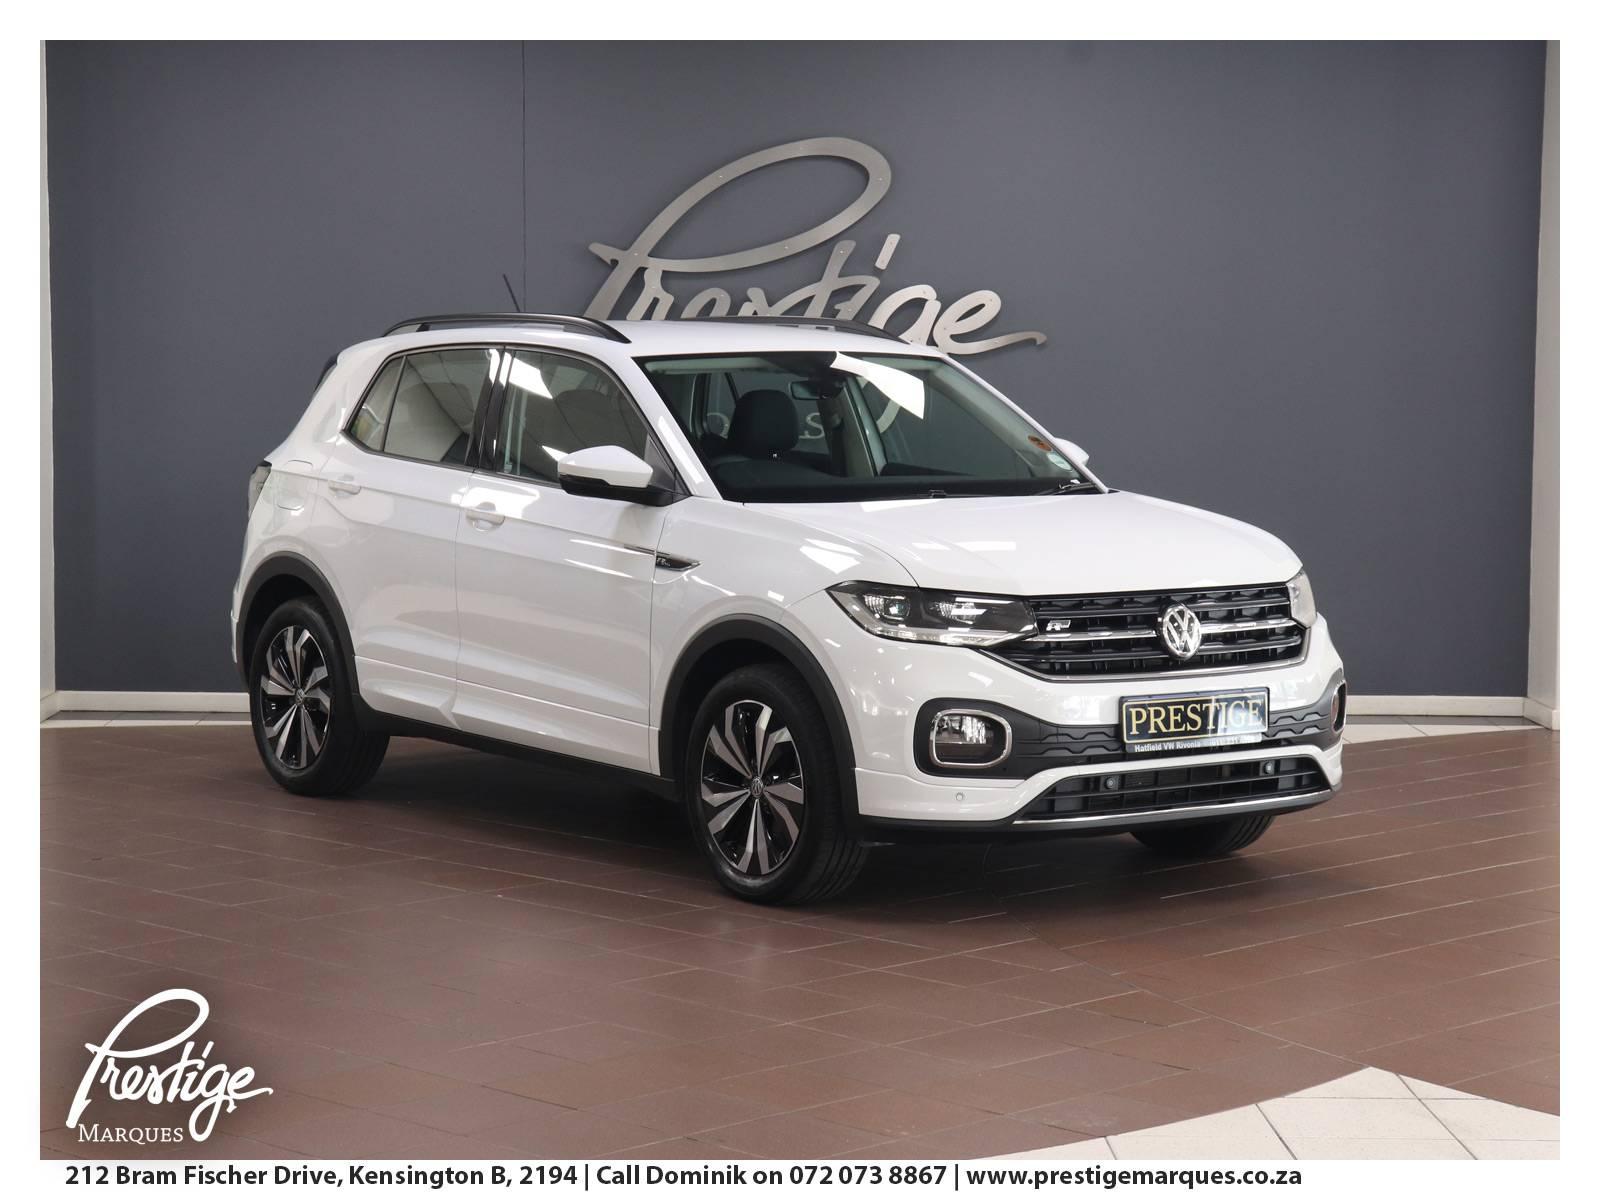 2019-Volkswagen-T-Cross-Prestige-Marques-Randburg-Sandton-1